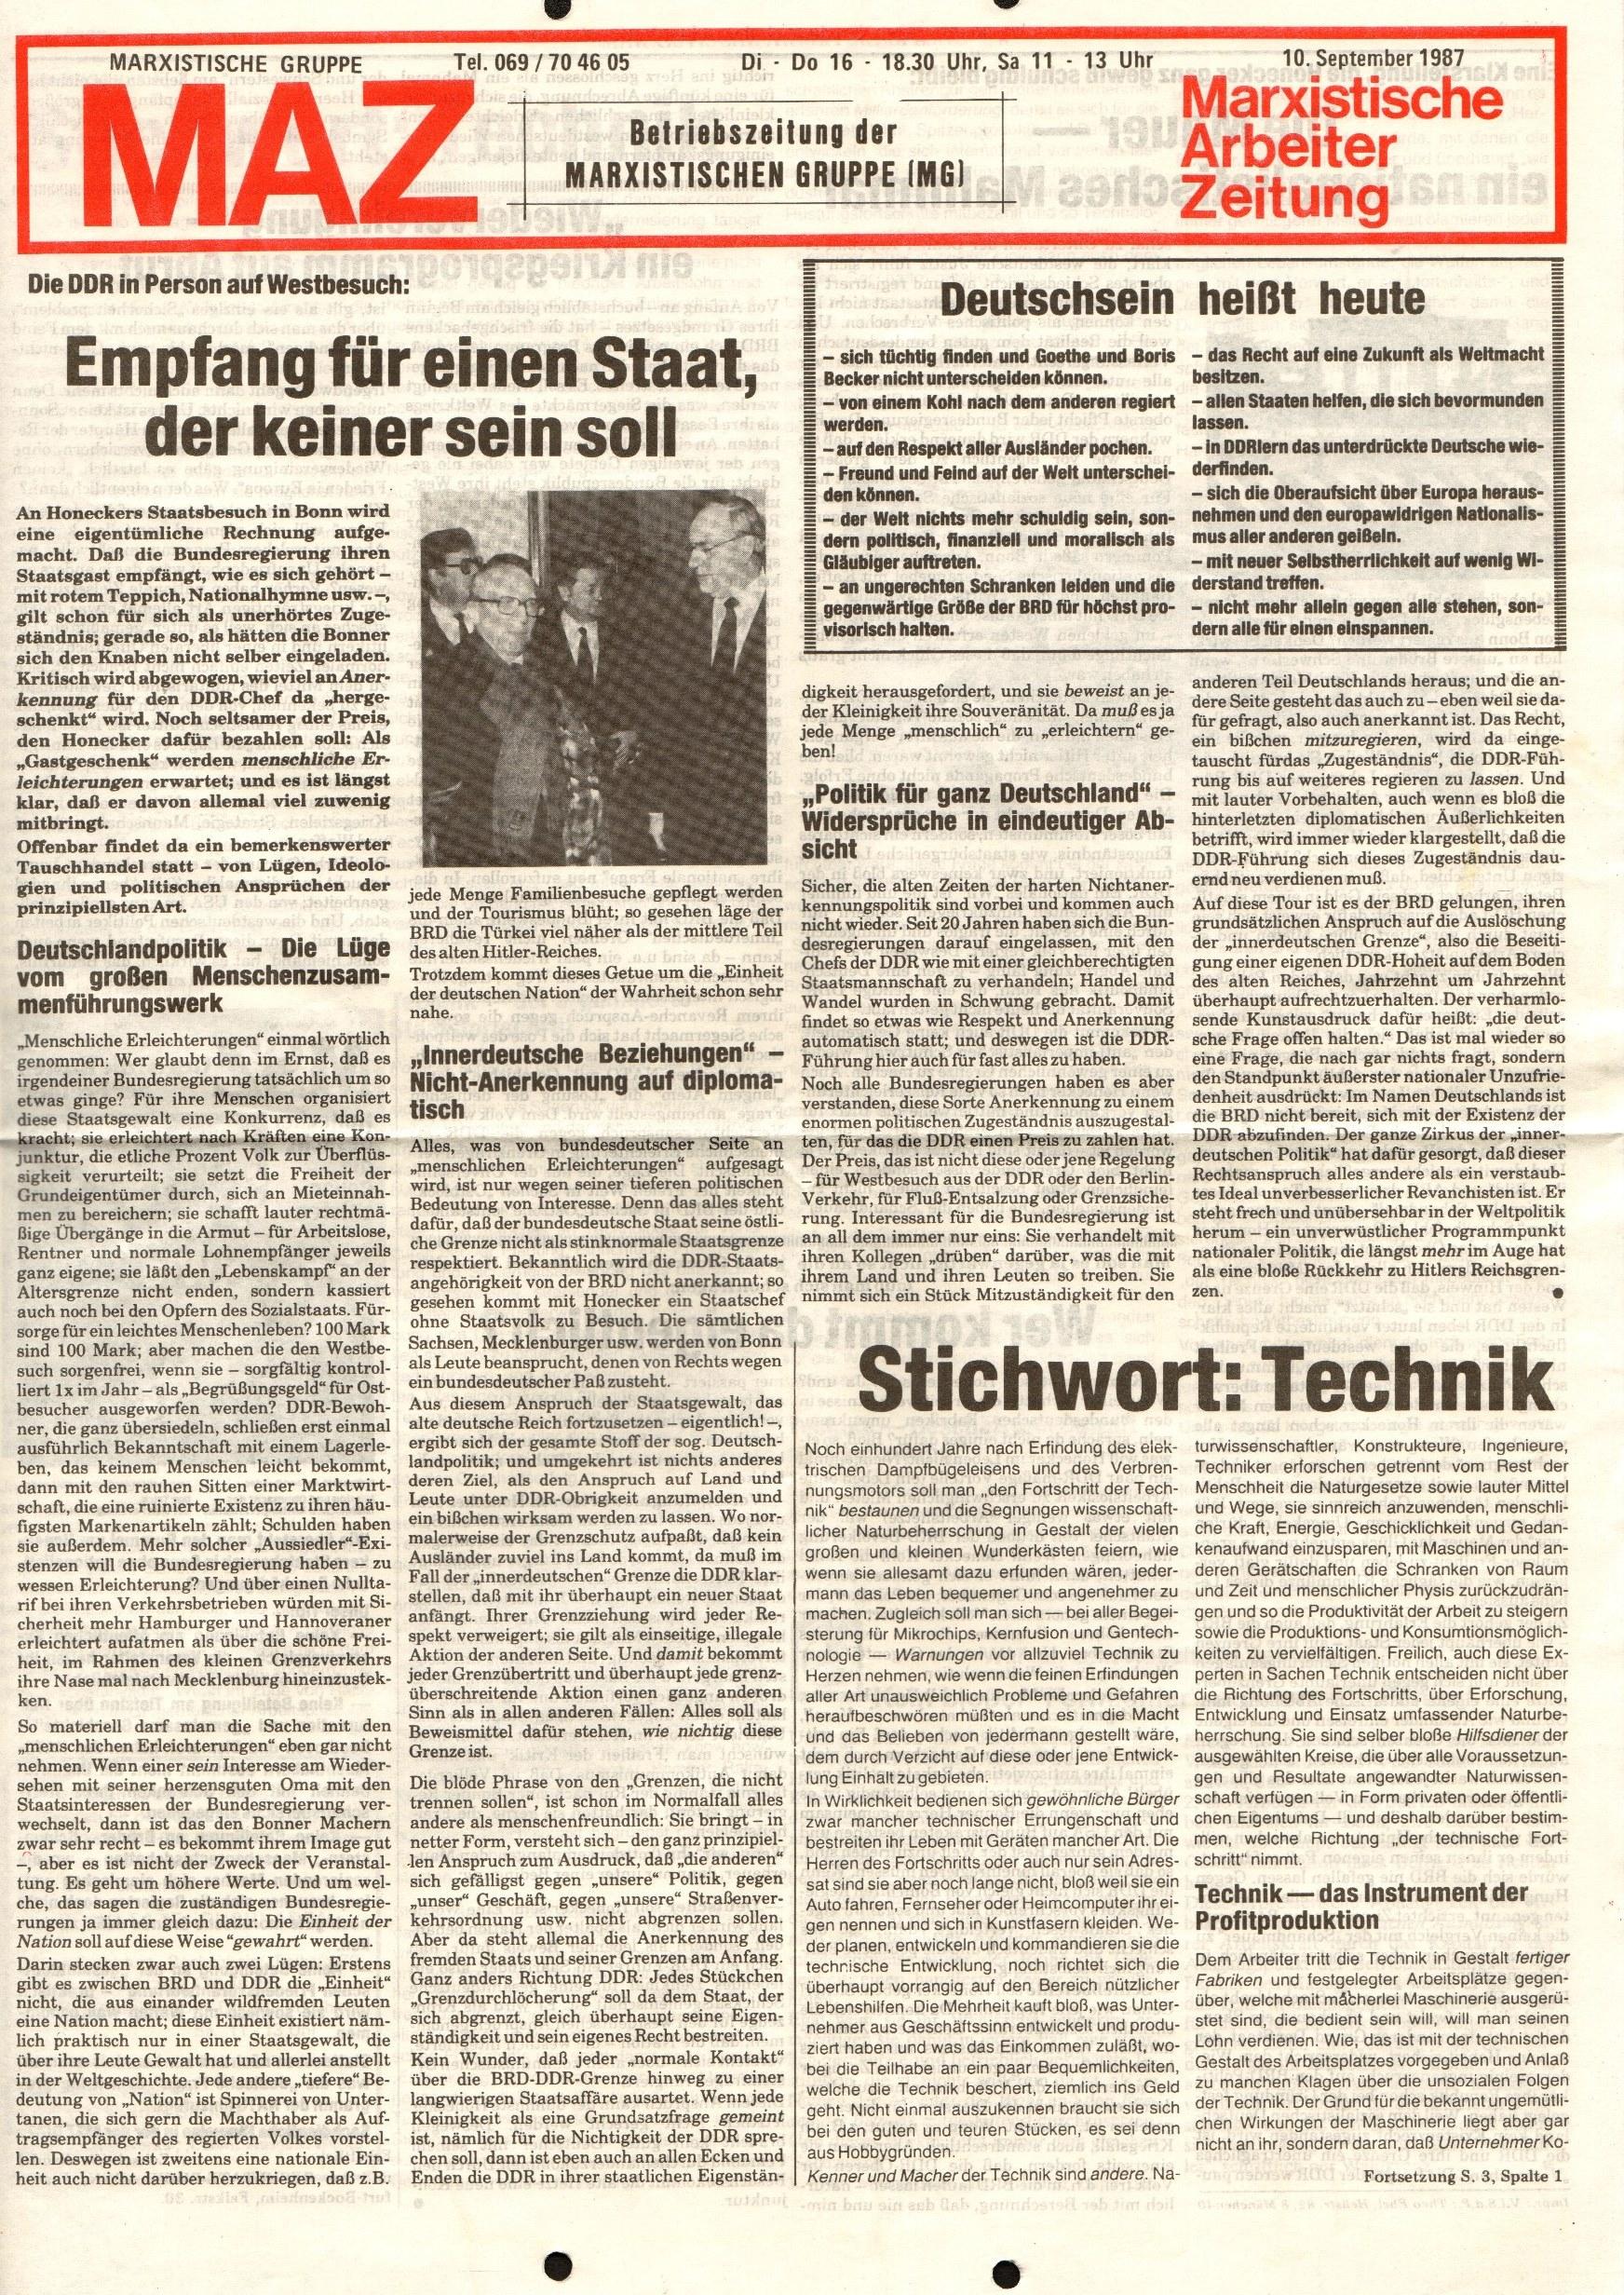 Frankfurt_CPK_Hoechst_MAZ461